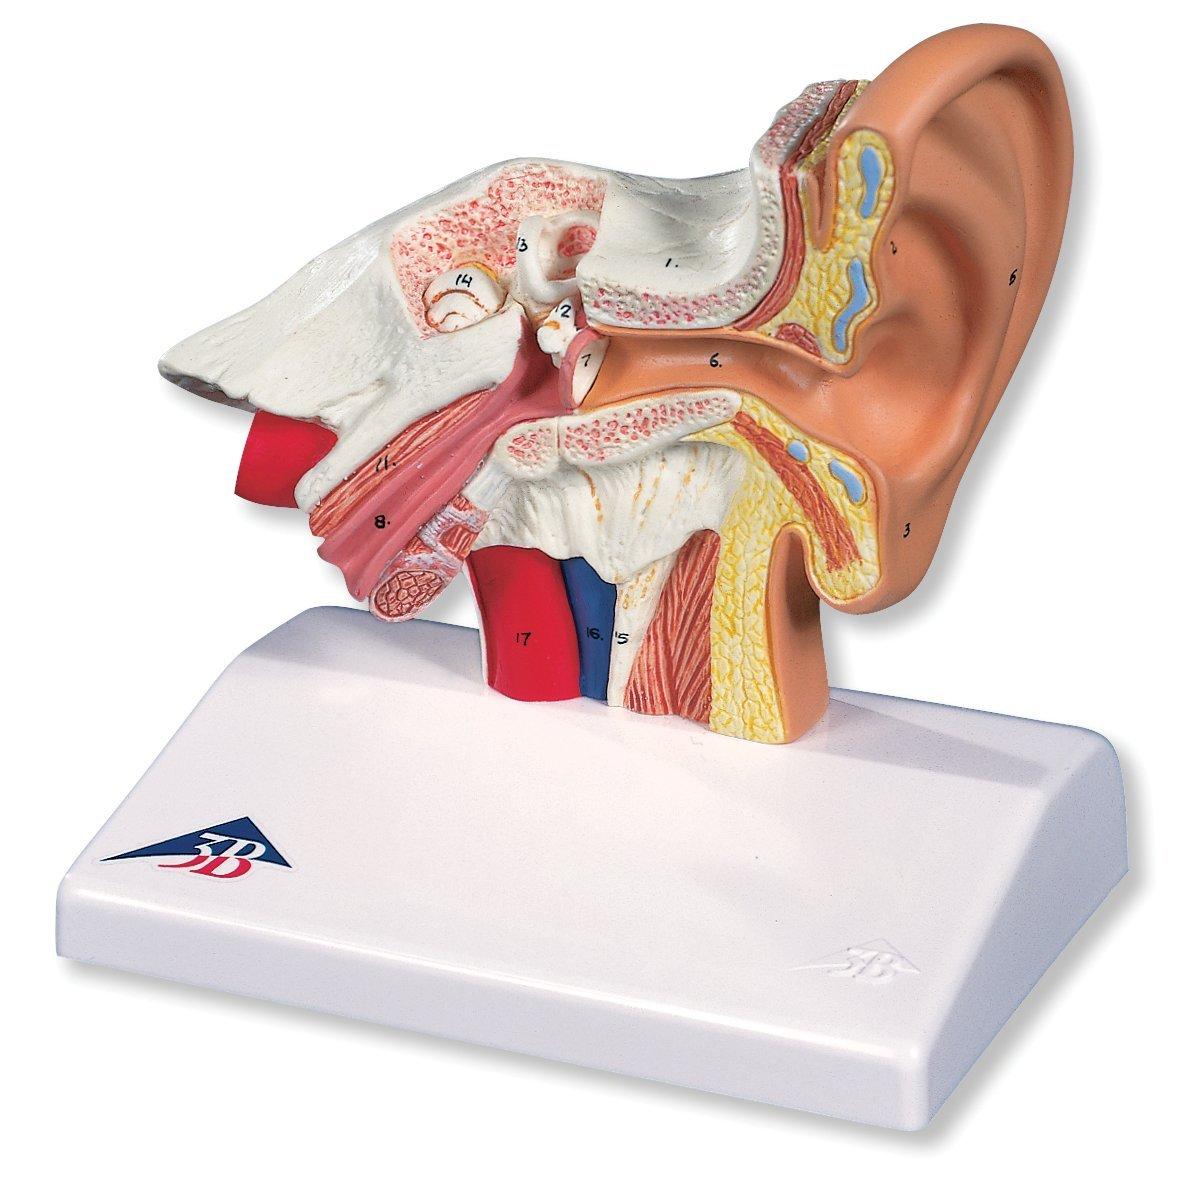 Cheap Ear Examination Model, find Ear Examination Model deals on ...